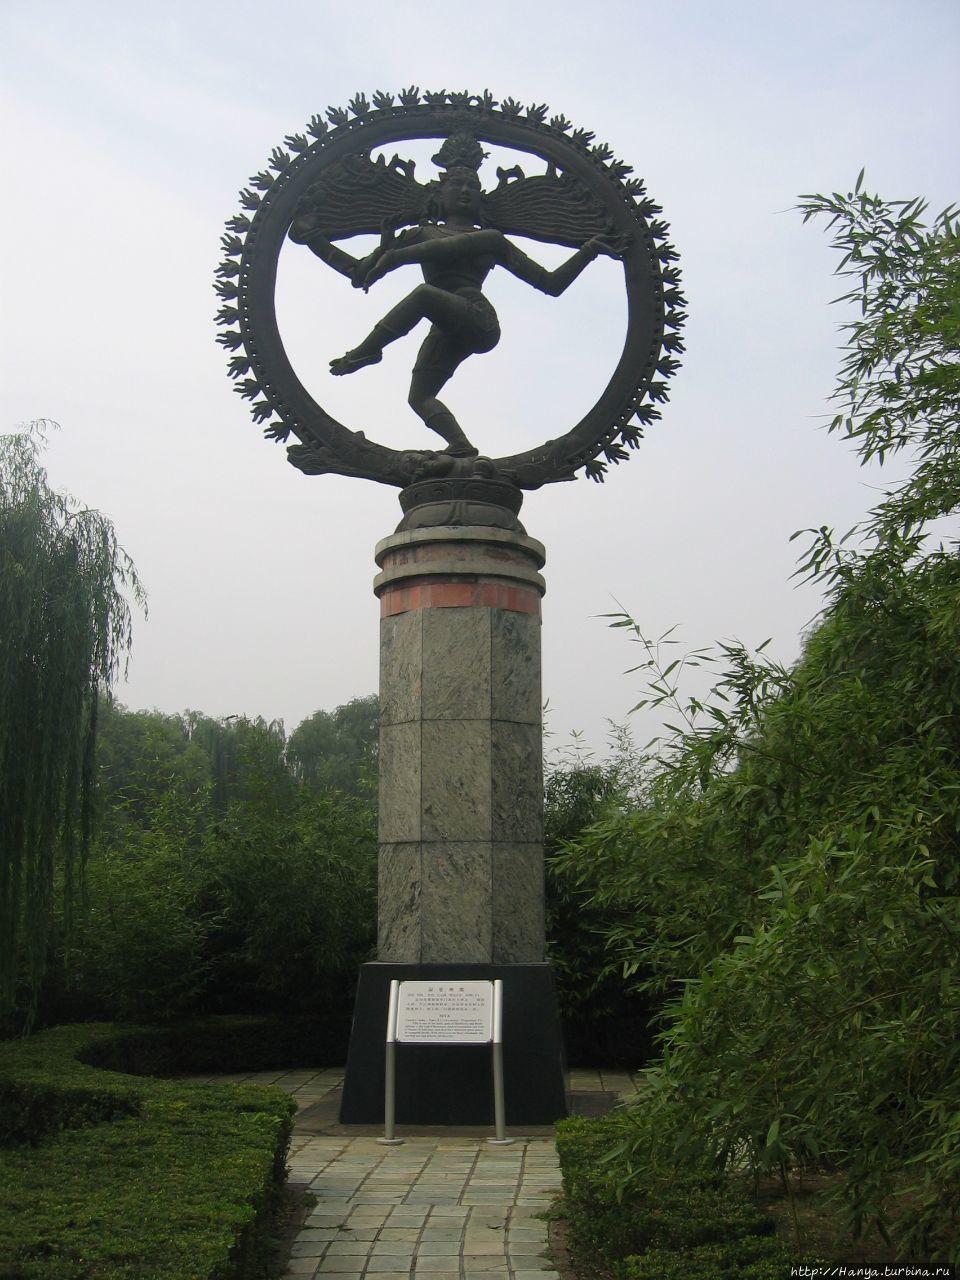 Пекин. Парк Миниатюр.Инди